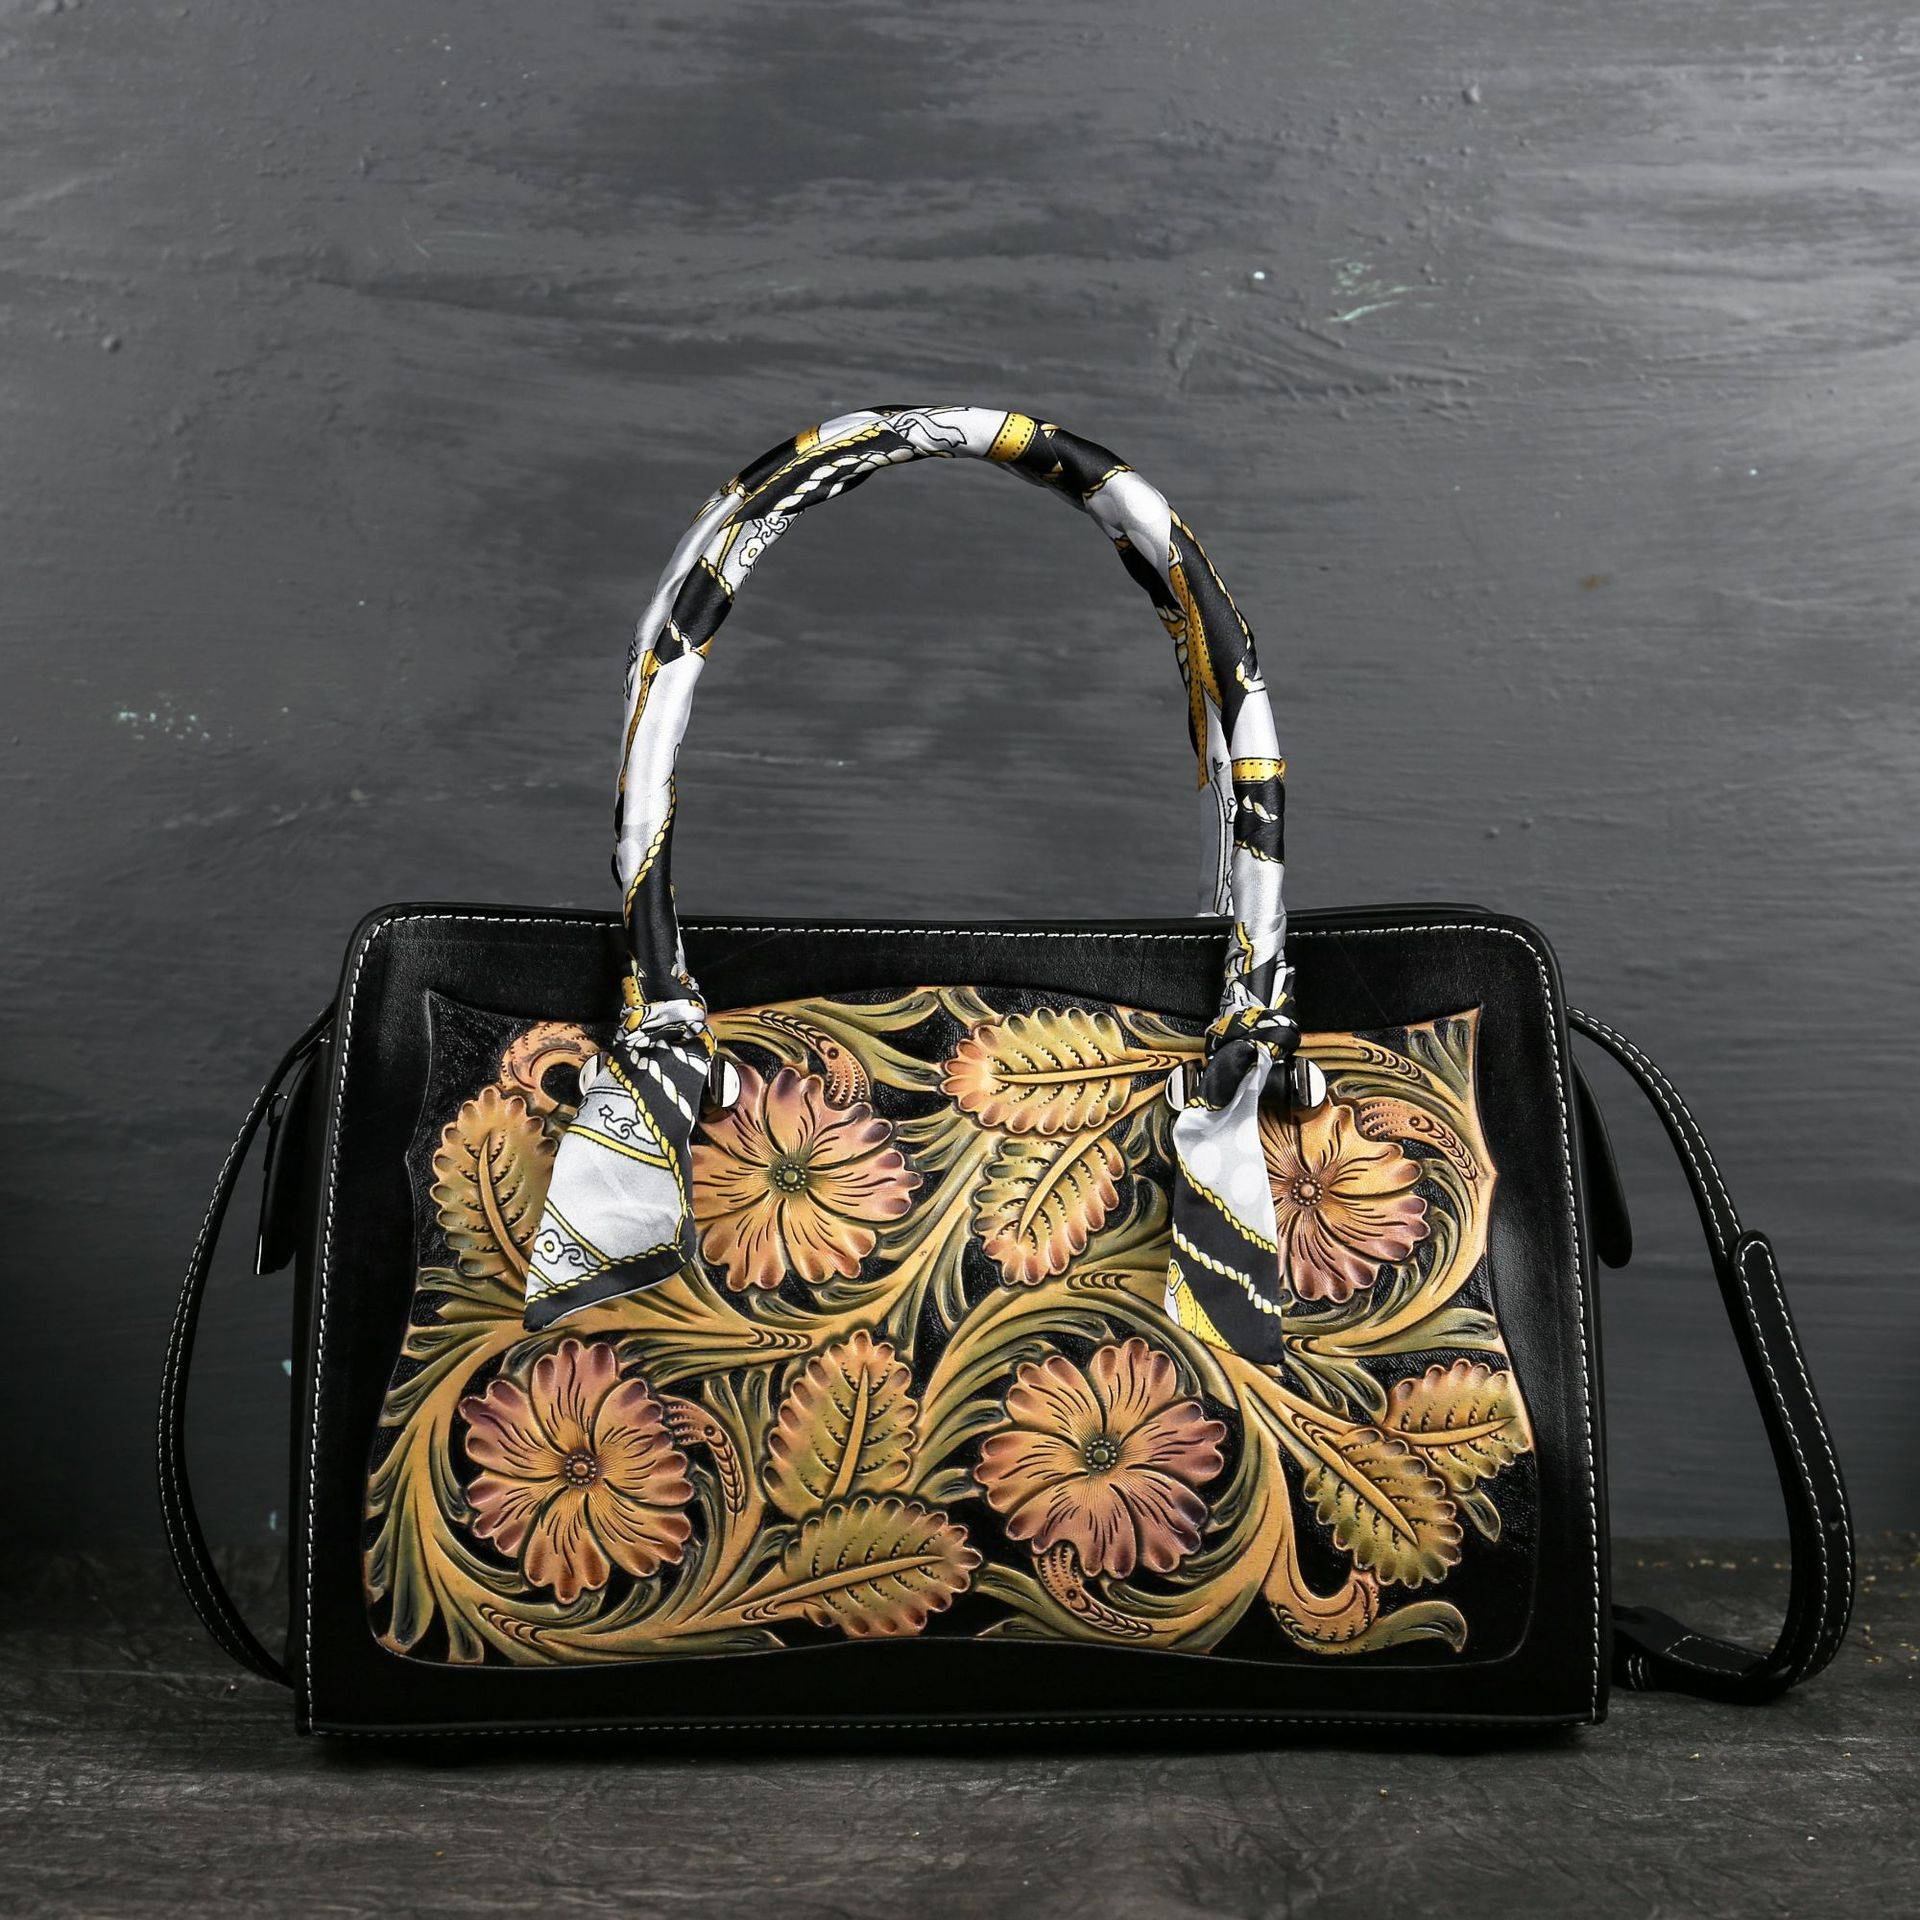 Johnature Designer Handbags High Quality Genuine Leather Women Bag 2020 New Retro Handmade Embossing Cowhide Shoulder Bag